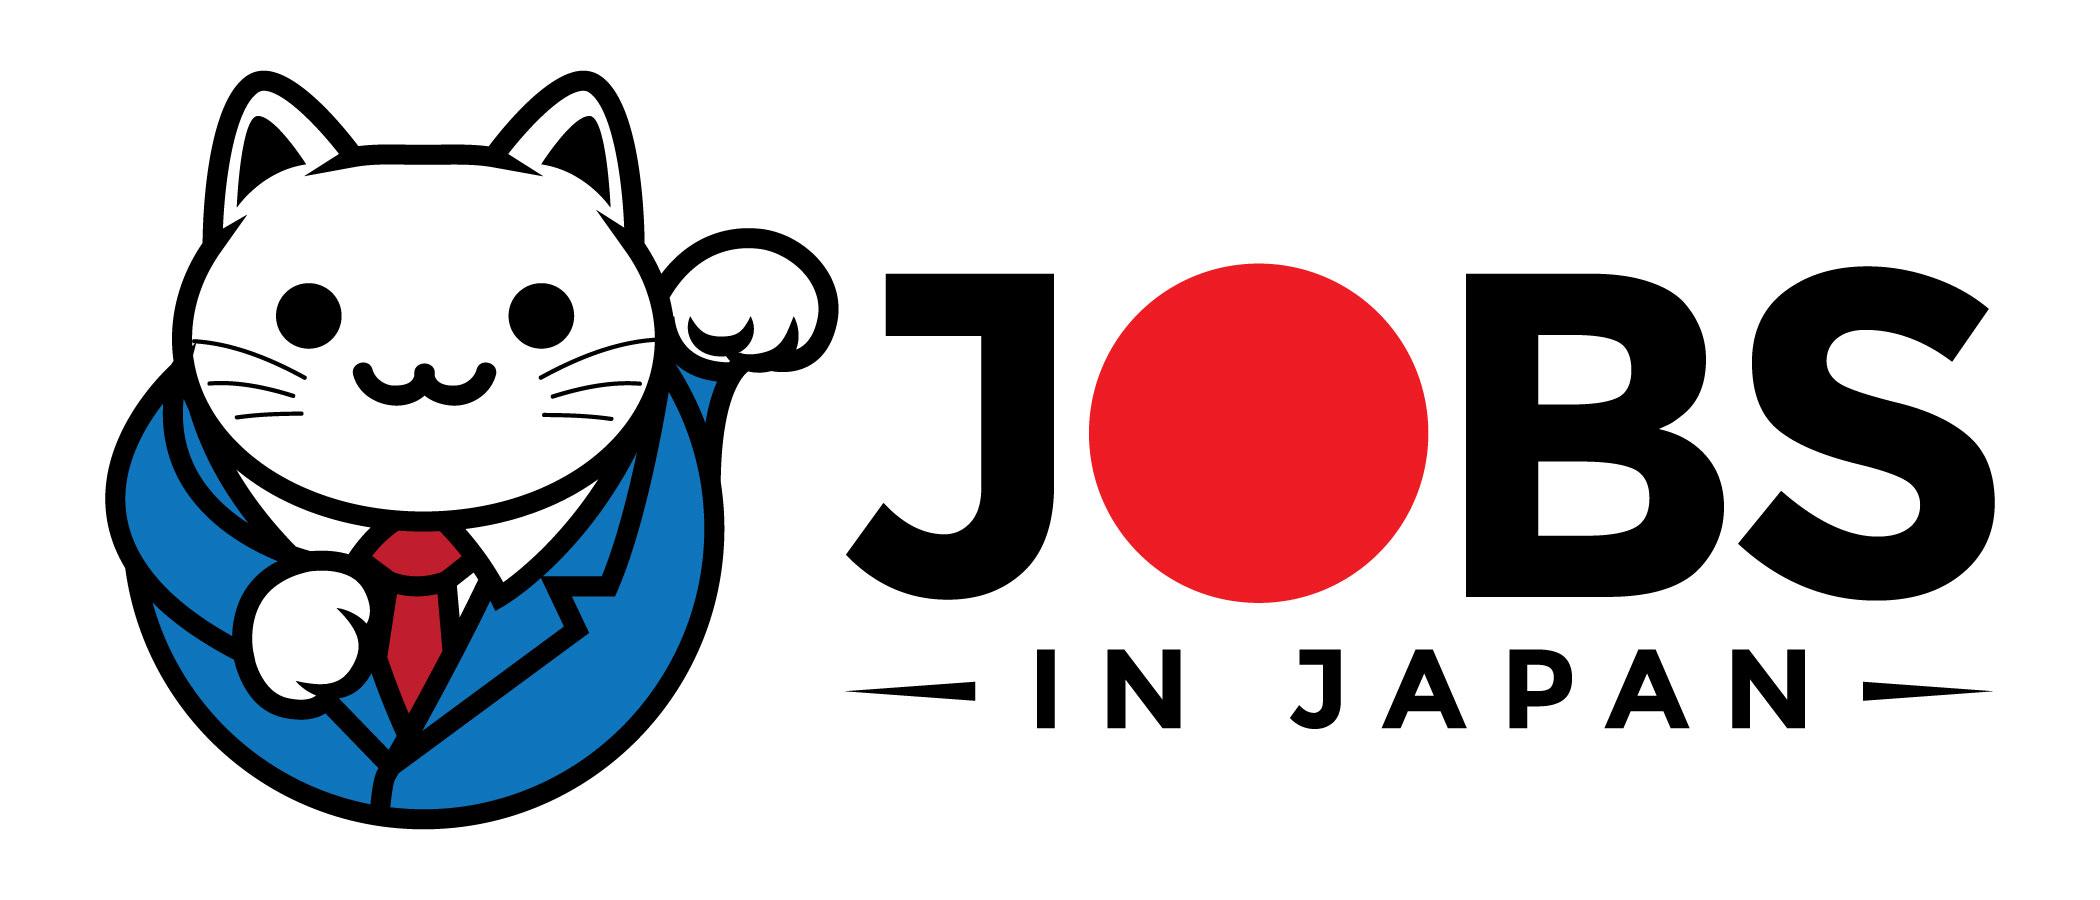 Home jobsinjapan com . Career clipart guest speaker